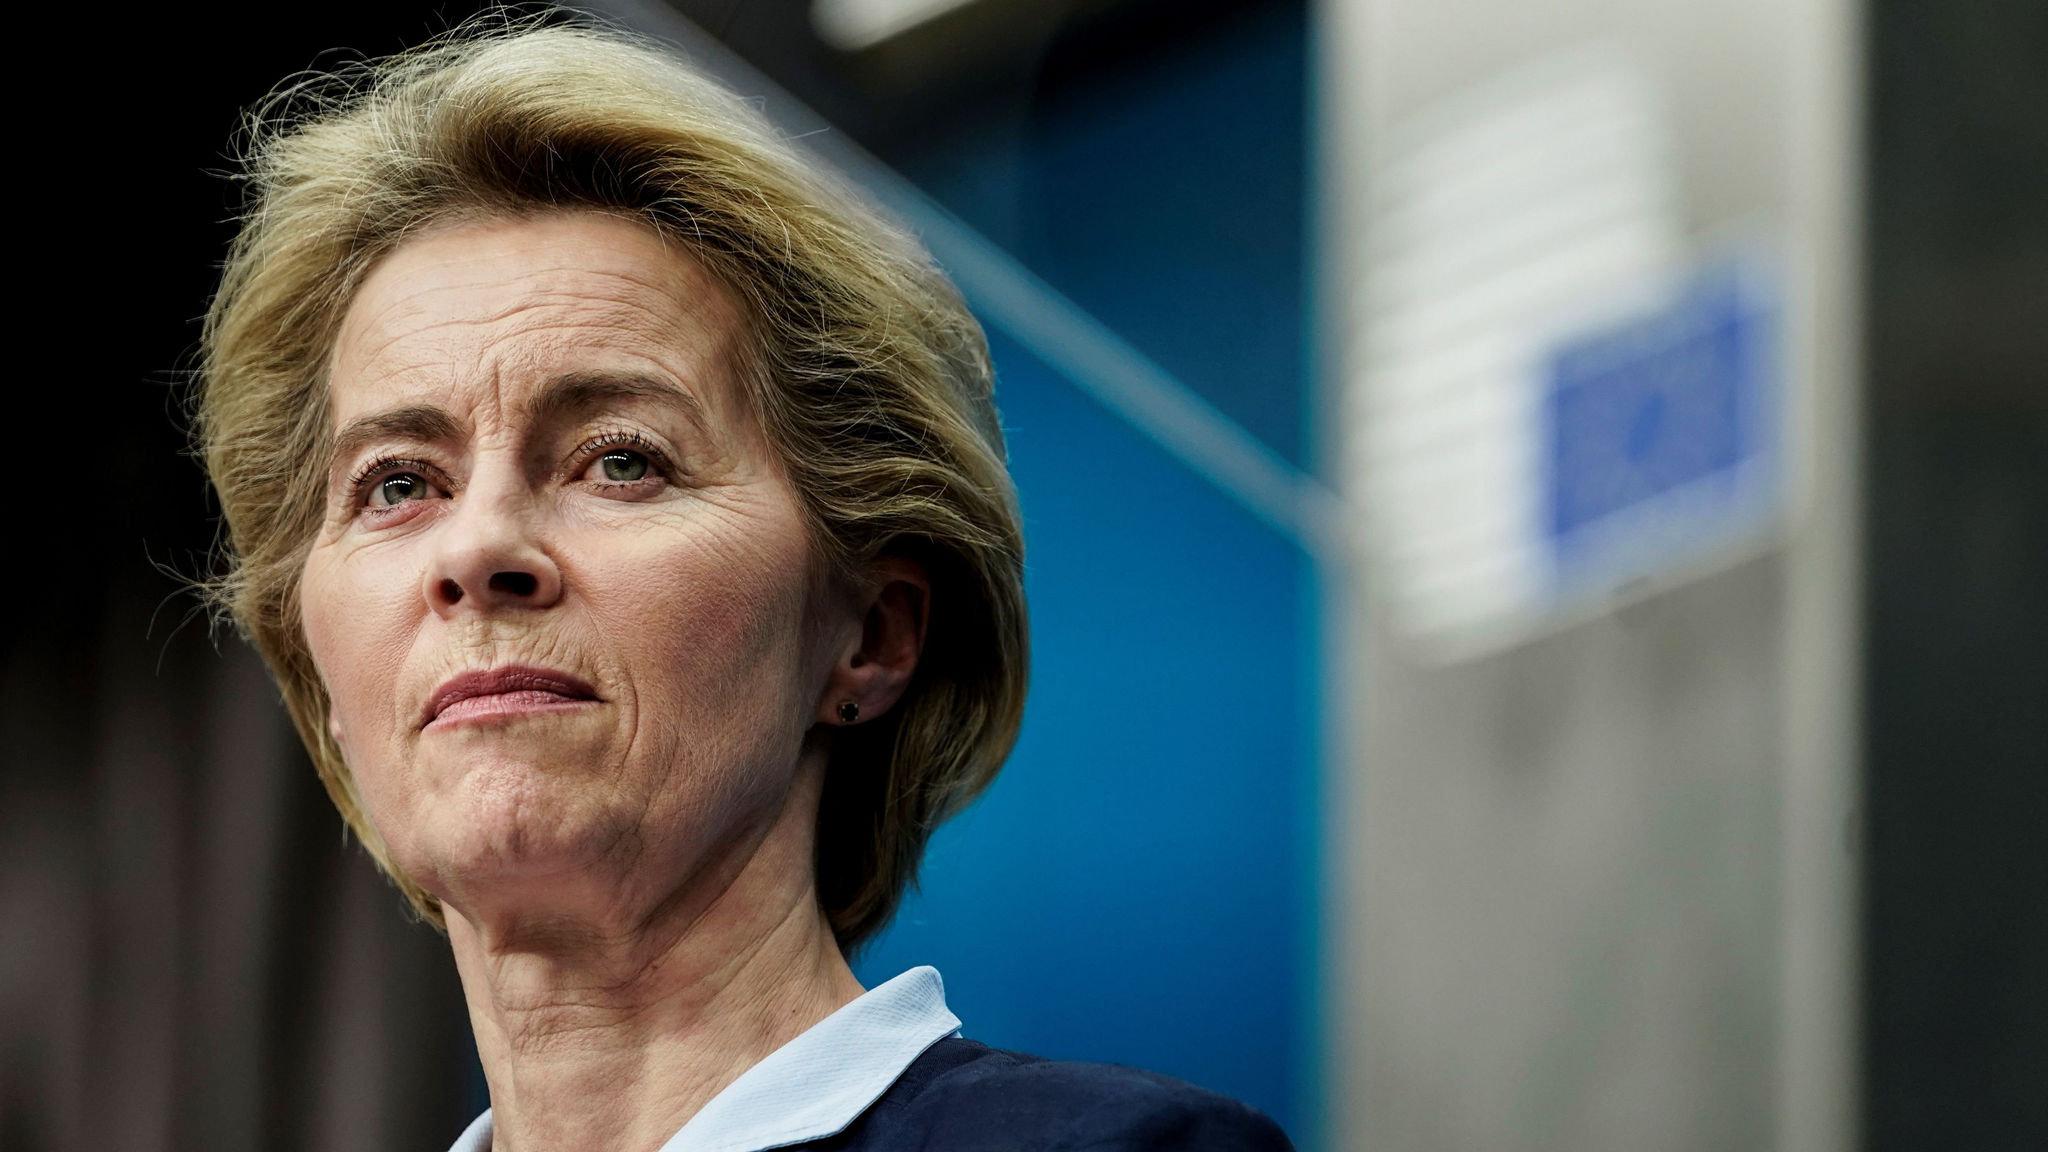 How life after Brexit will get uncomfortable for Von der Leyen